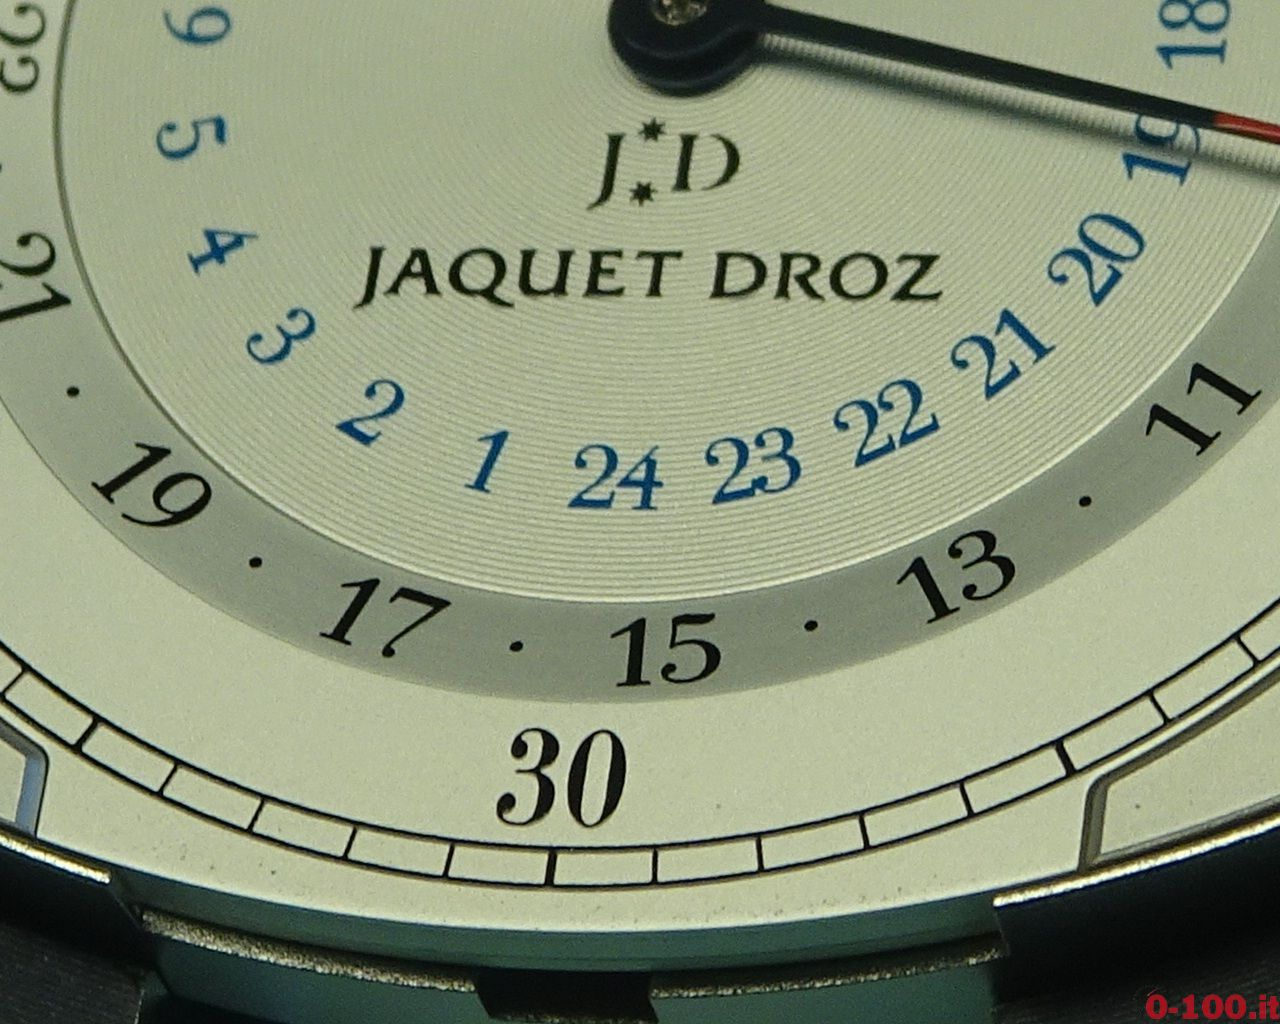 gli-speciali-di-0-100-it-jaquet-droz-la-manifattura-di-la-chaux-de-fonds_0-1008